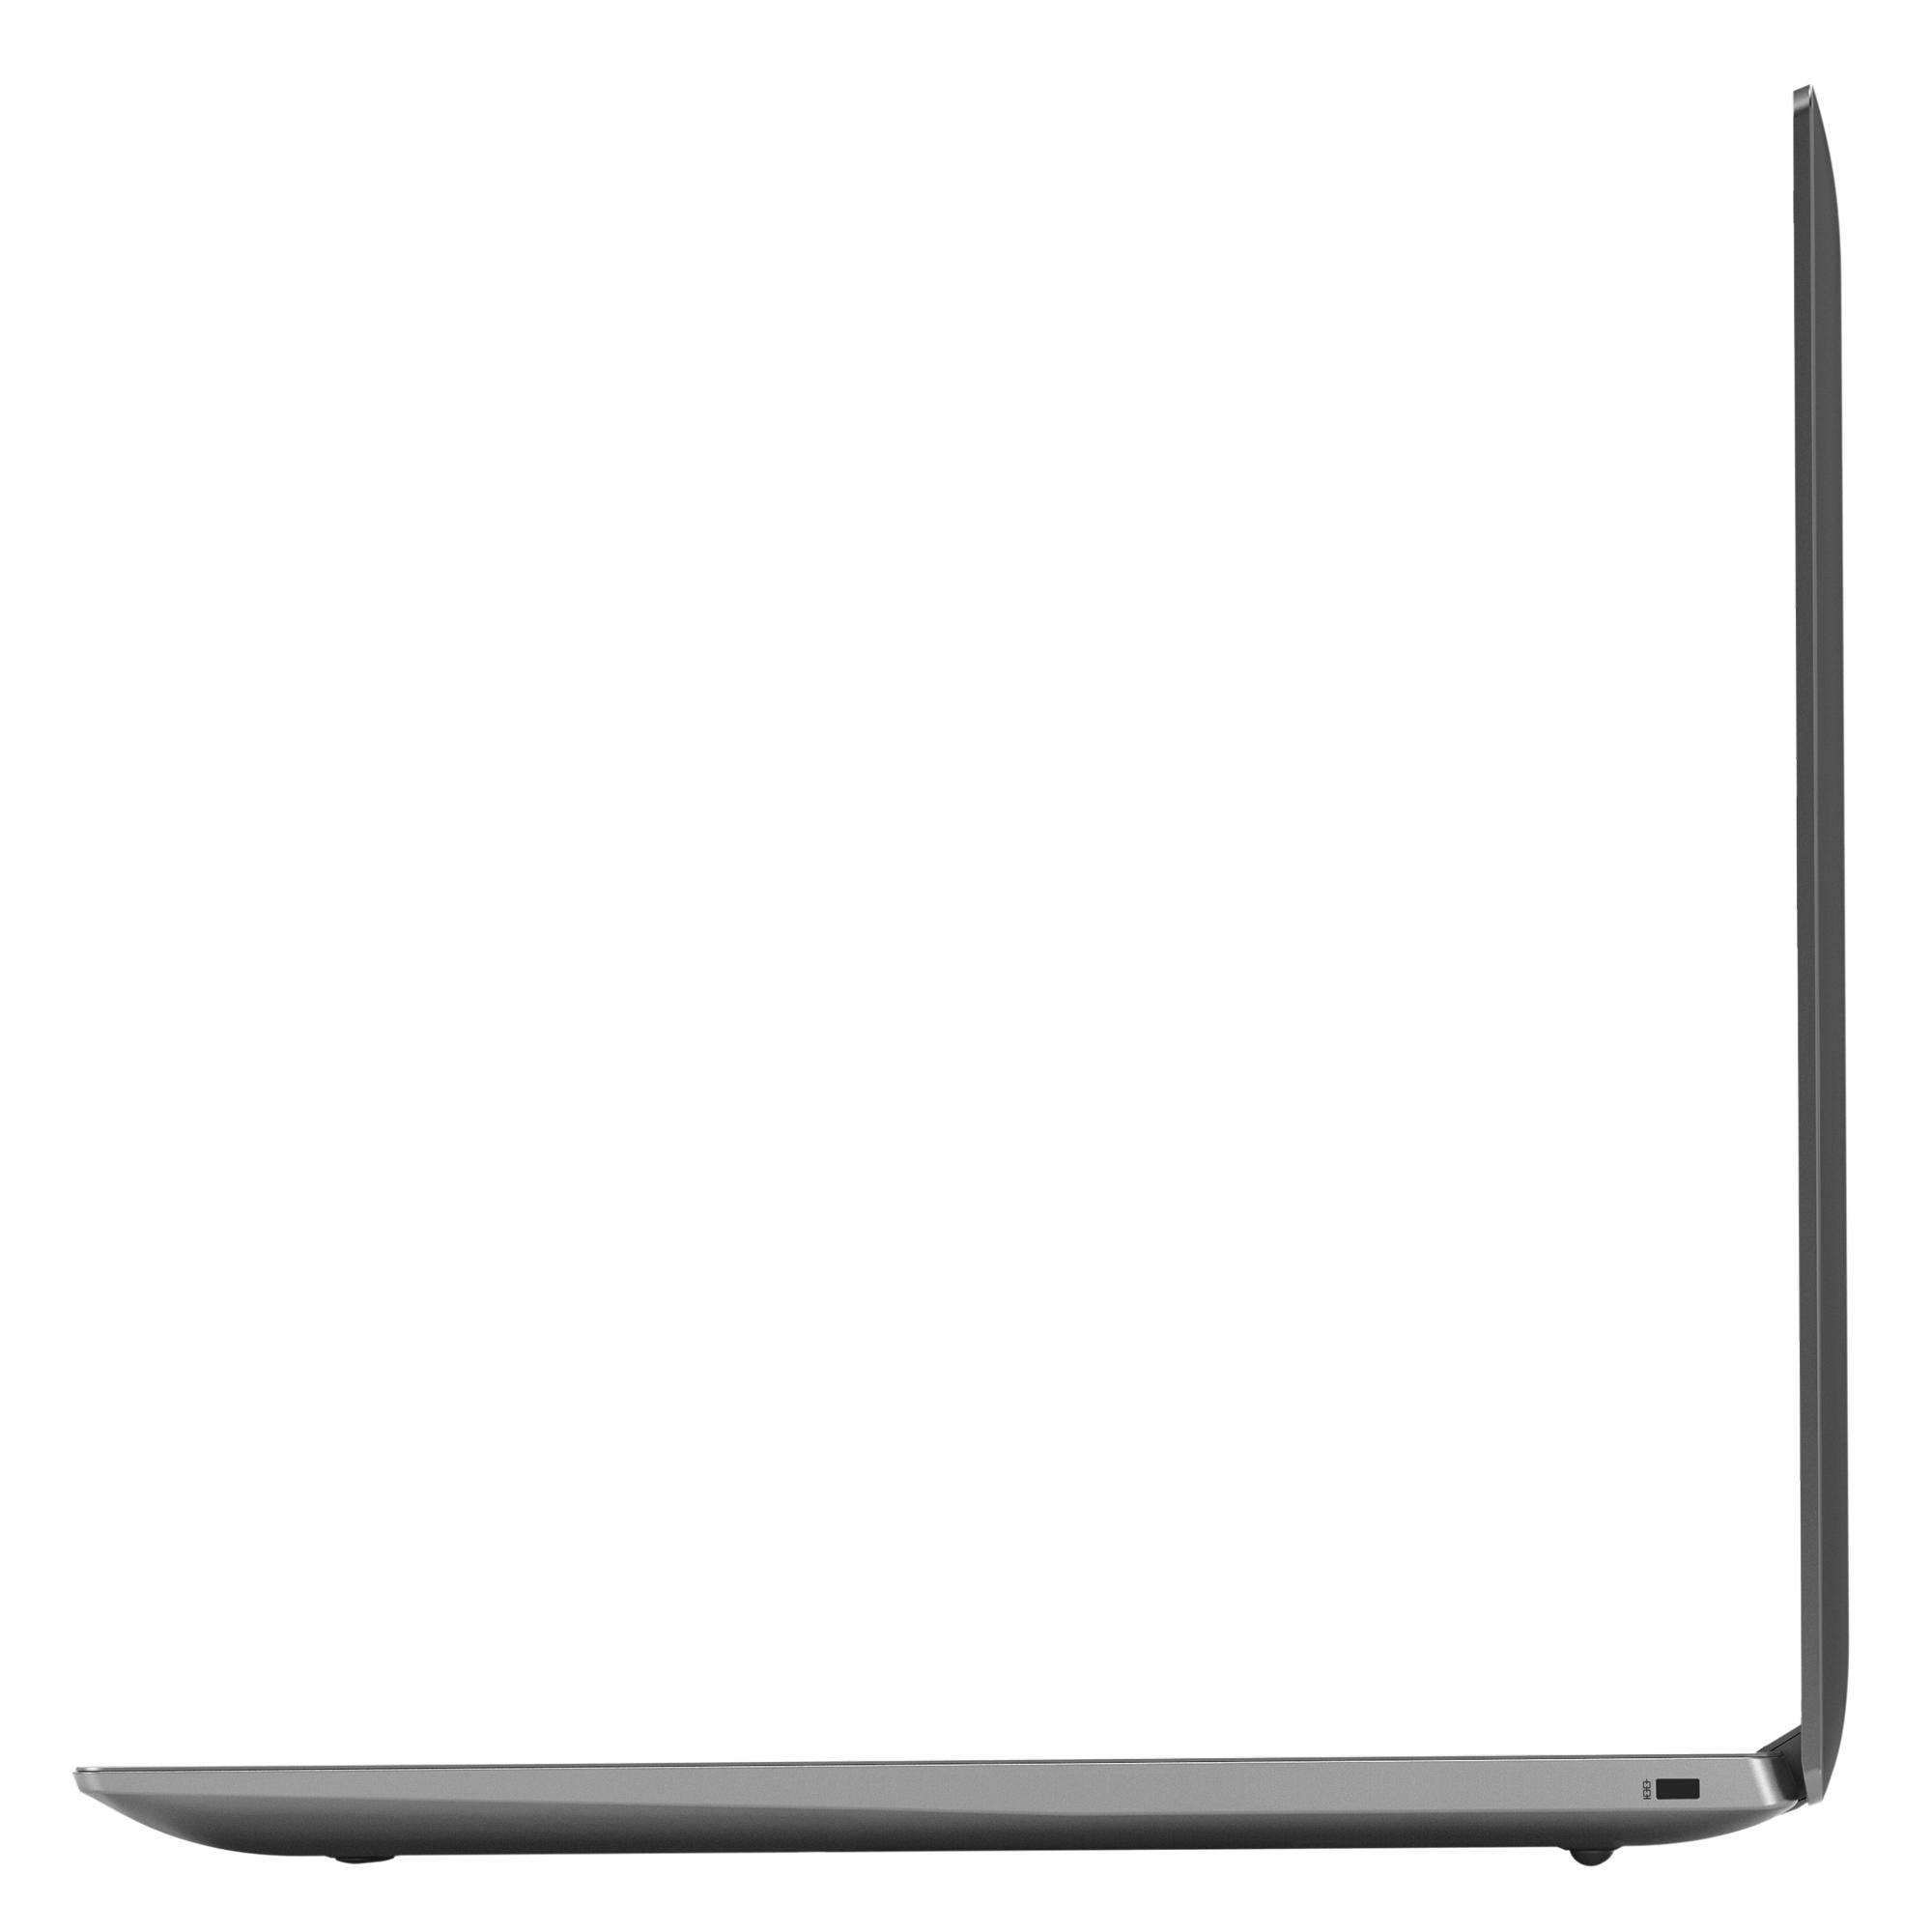 Фото  Ноутбук Lenovo ideapad 330-17IKB Onyx Black (81DK006JRA)